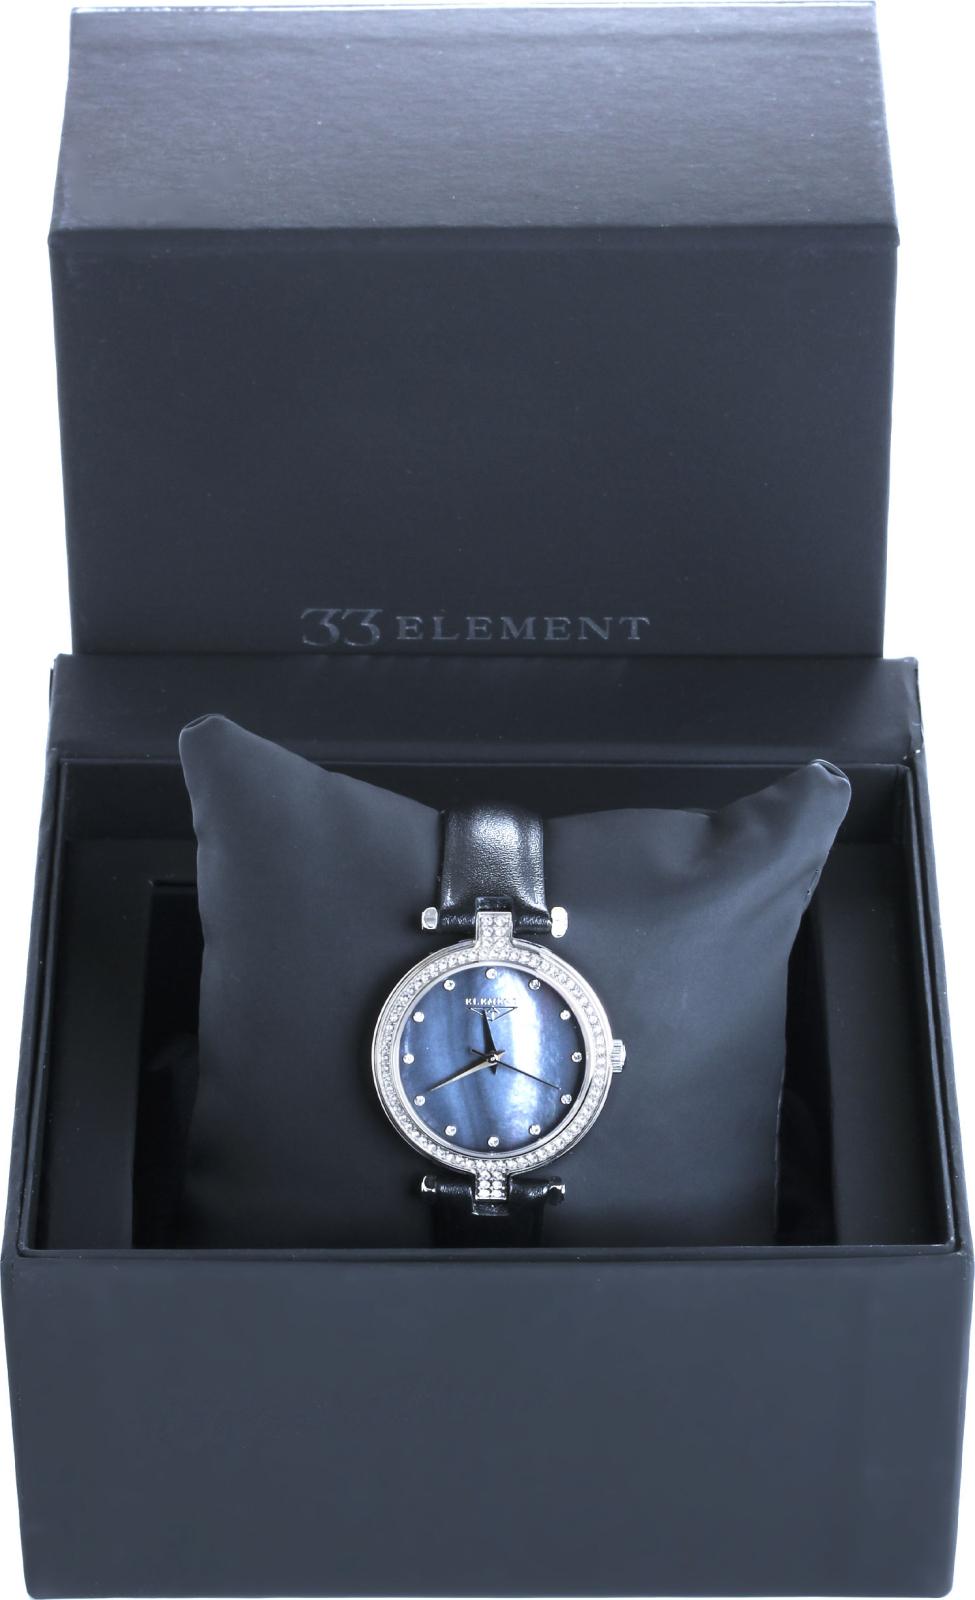 33 Element 331511